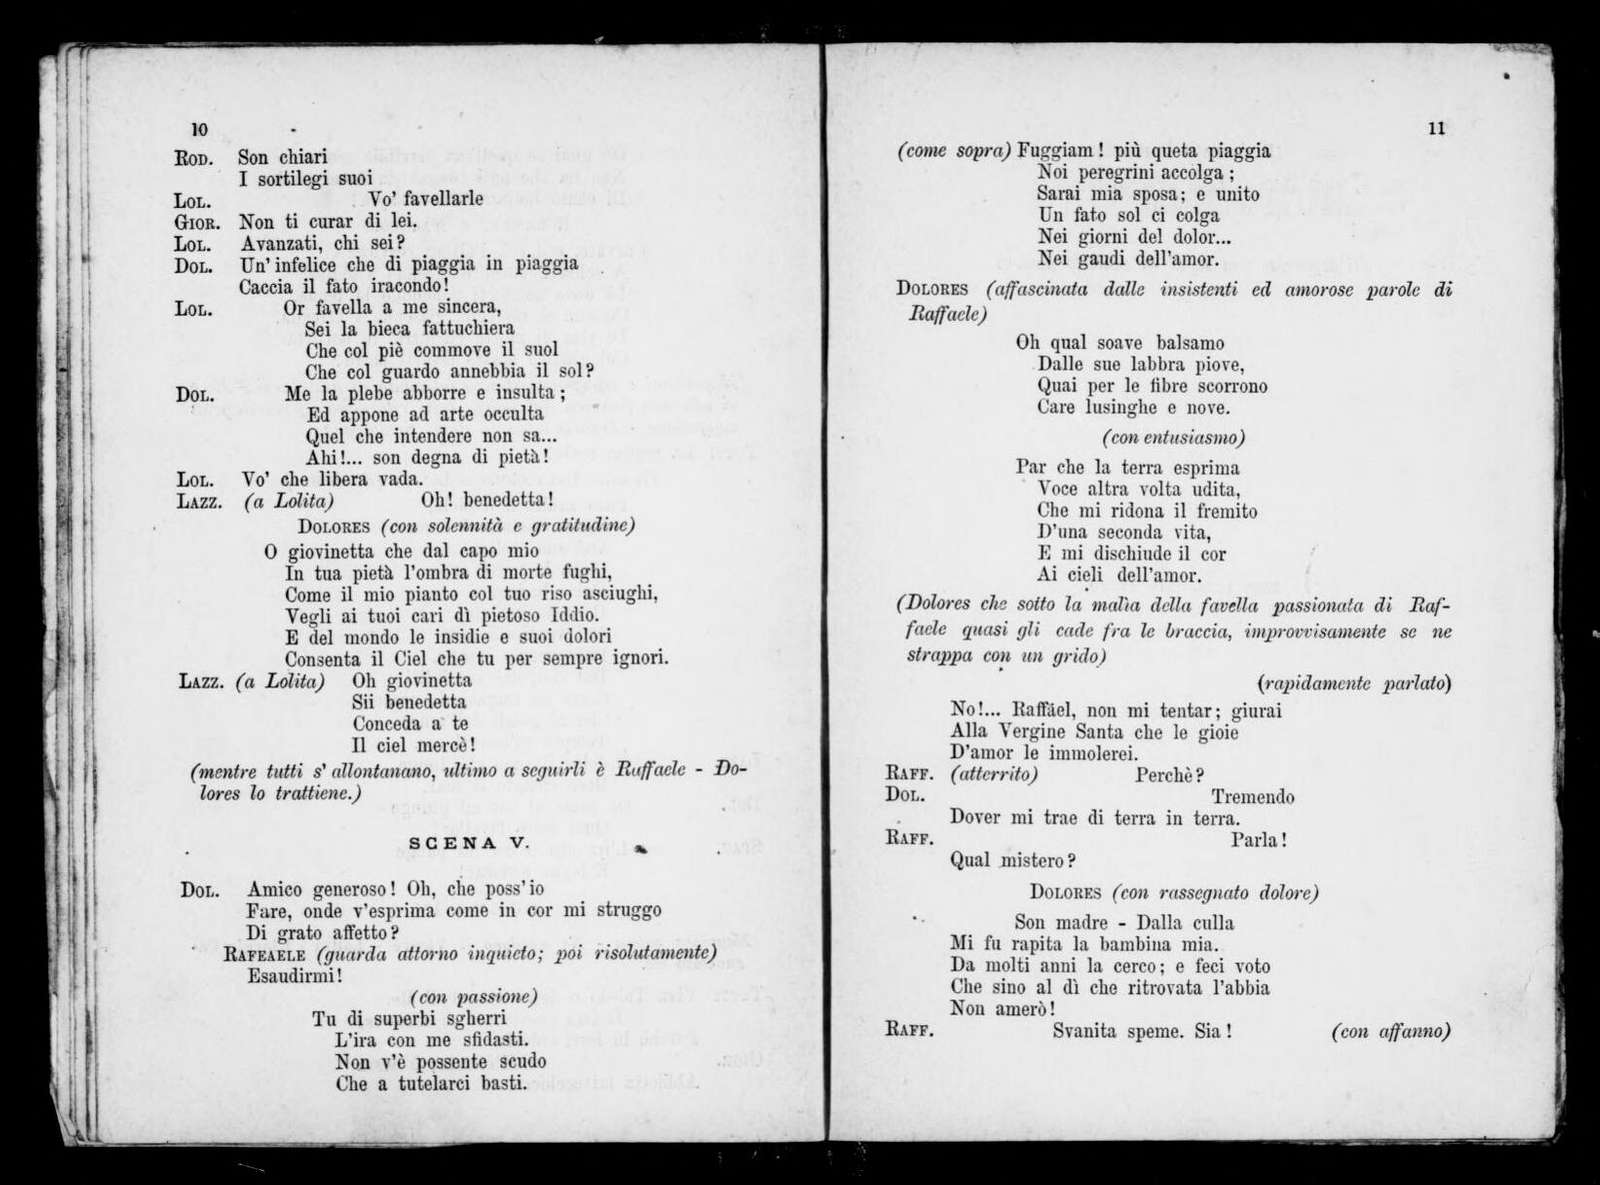 Catalana. Libretto. Italian